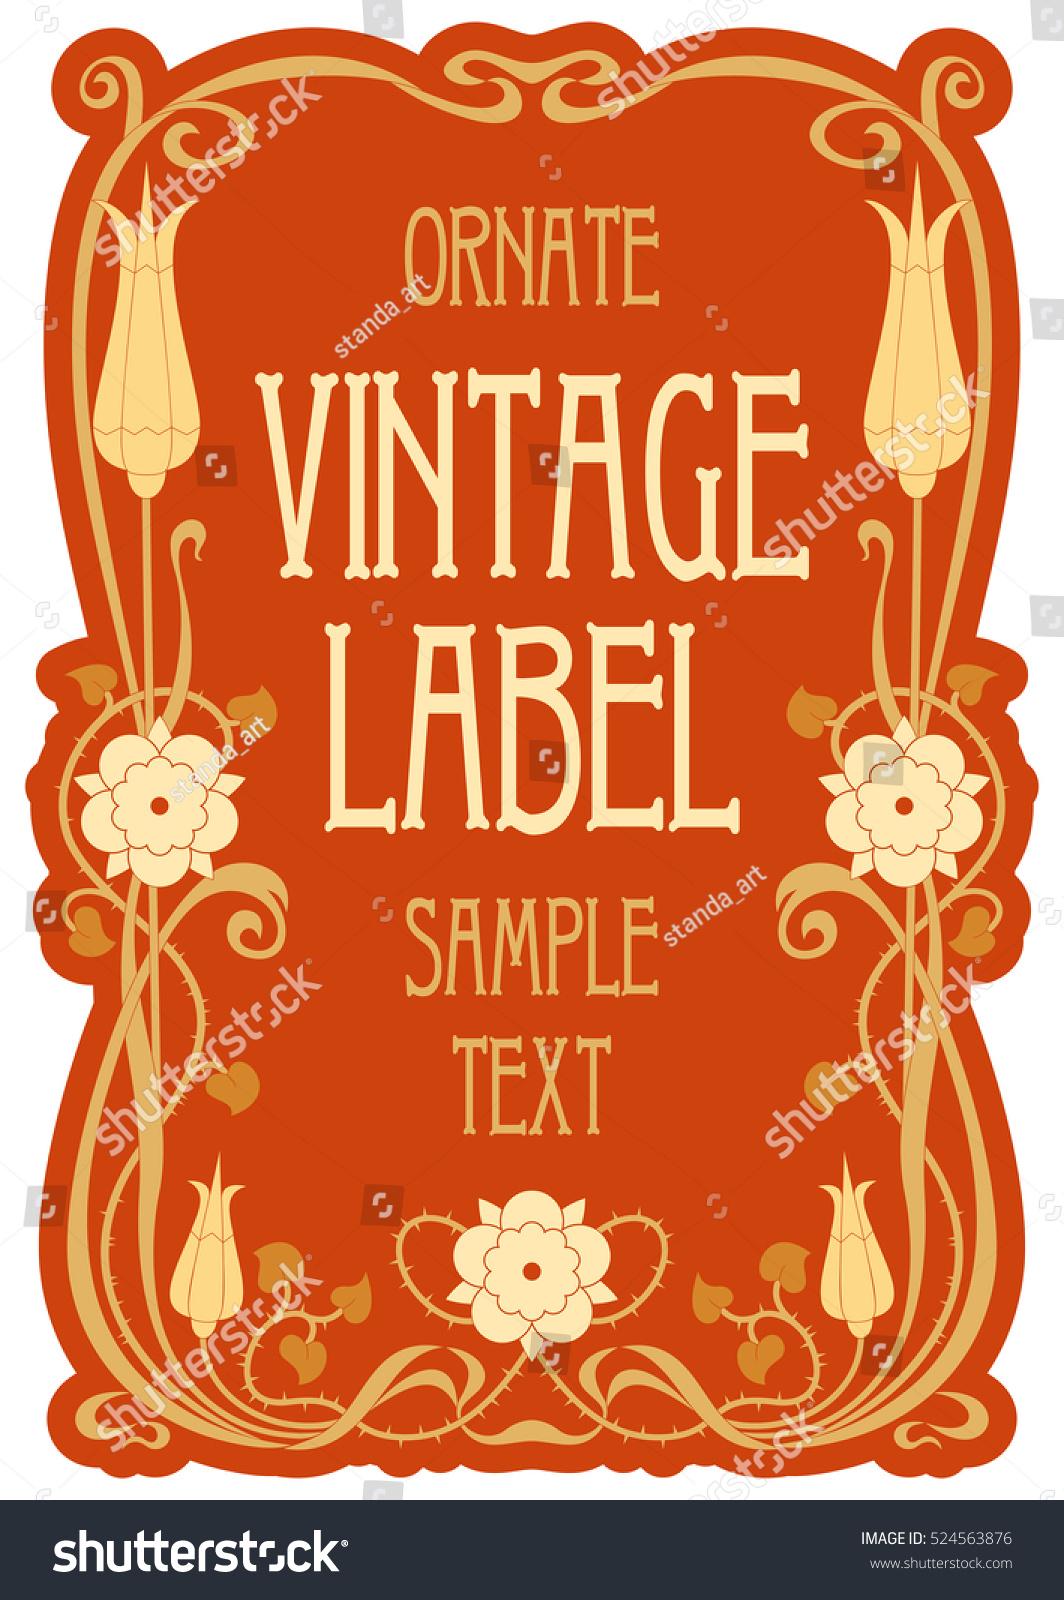 Vector Vintage Items Label Art Nouveau Stock Vector HD (Royalty Free ...